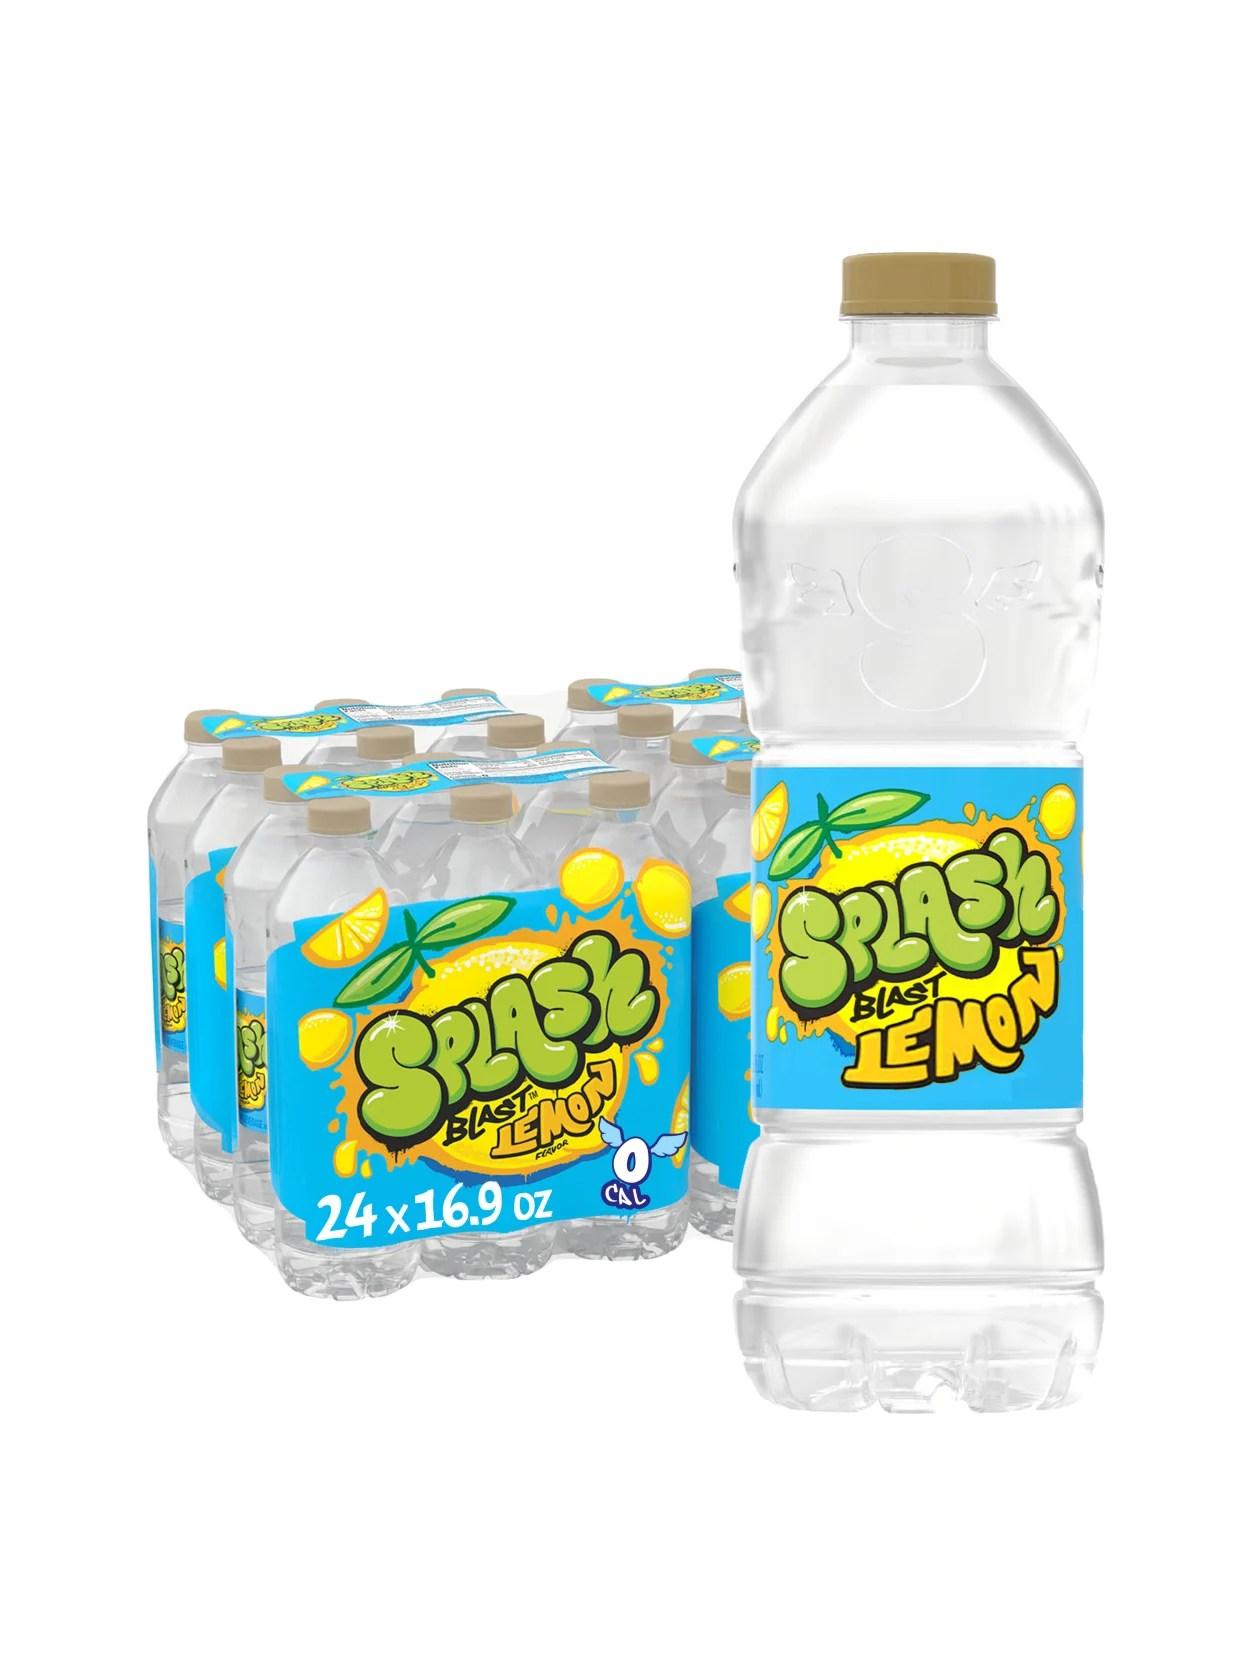 Is Nestle Splash Good For You : nestle, splash, Nestl, Splash, Natural, Lemon, Flavored, Water, Beverage, Bottles, Office, Depot